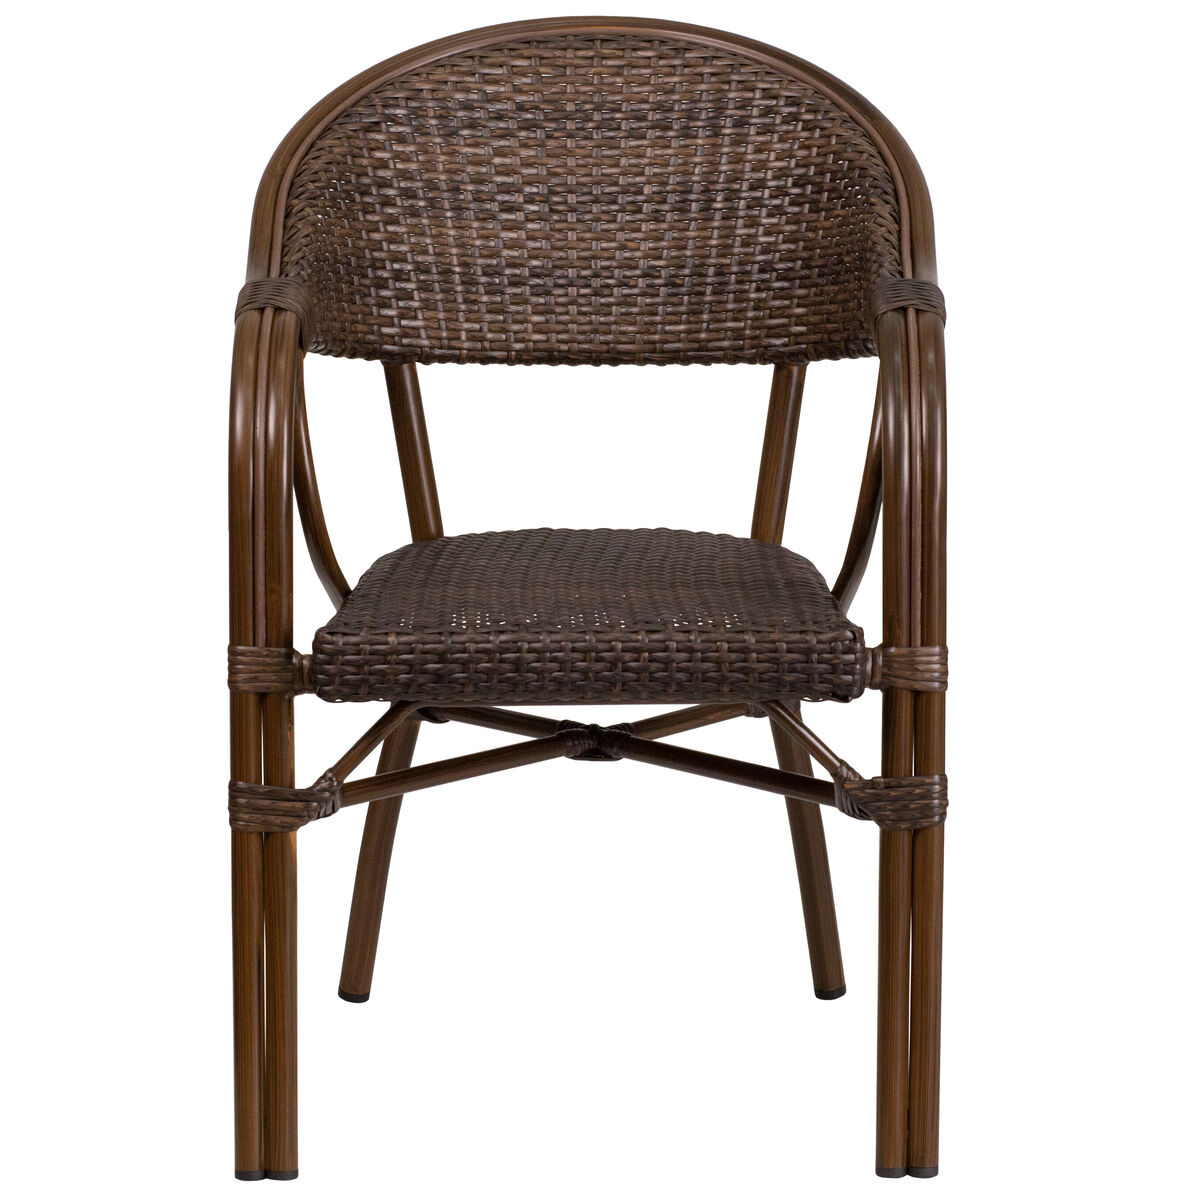 Rattan Bamboo Aluminum Chair Sda Ad642003r 1 Gg Stackchairs4less Com